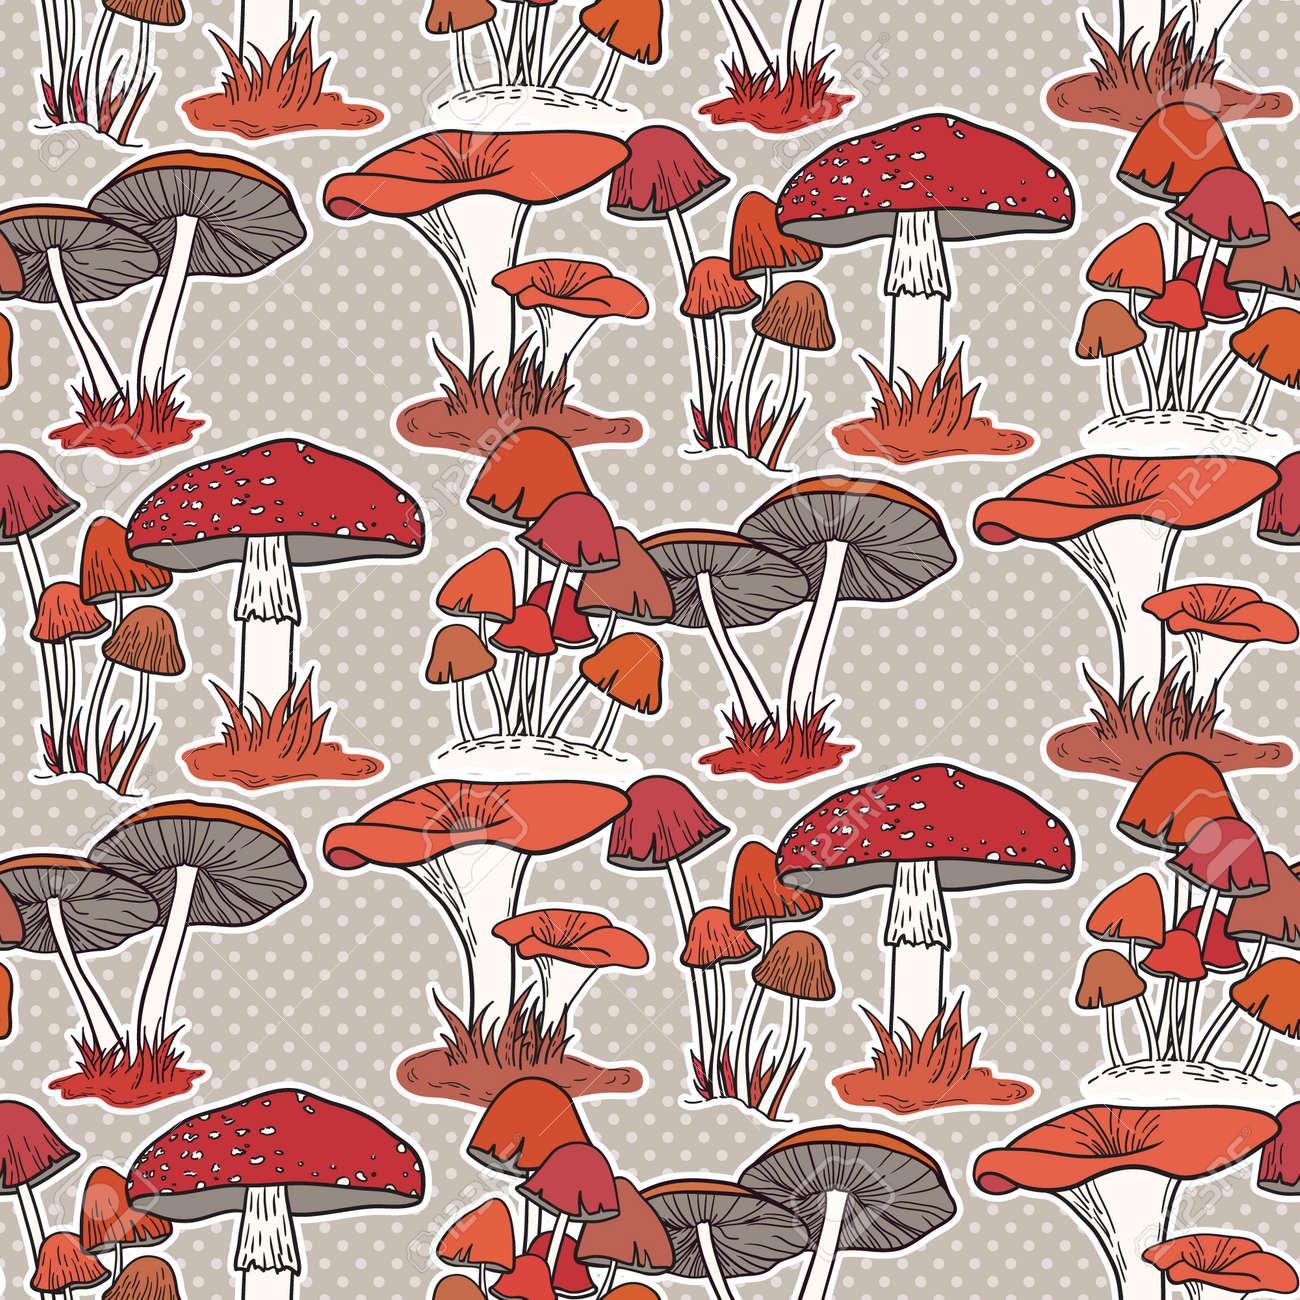 Colorful mushrooms seamless vector pattern - 30536065